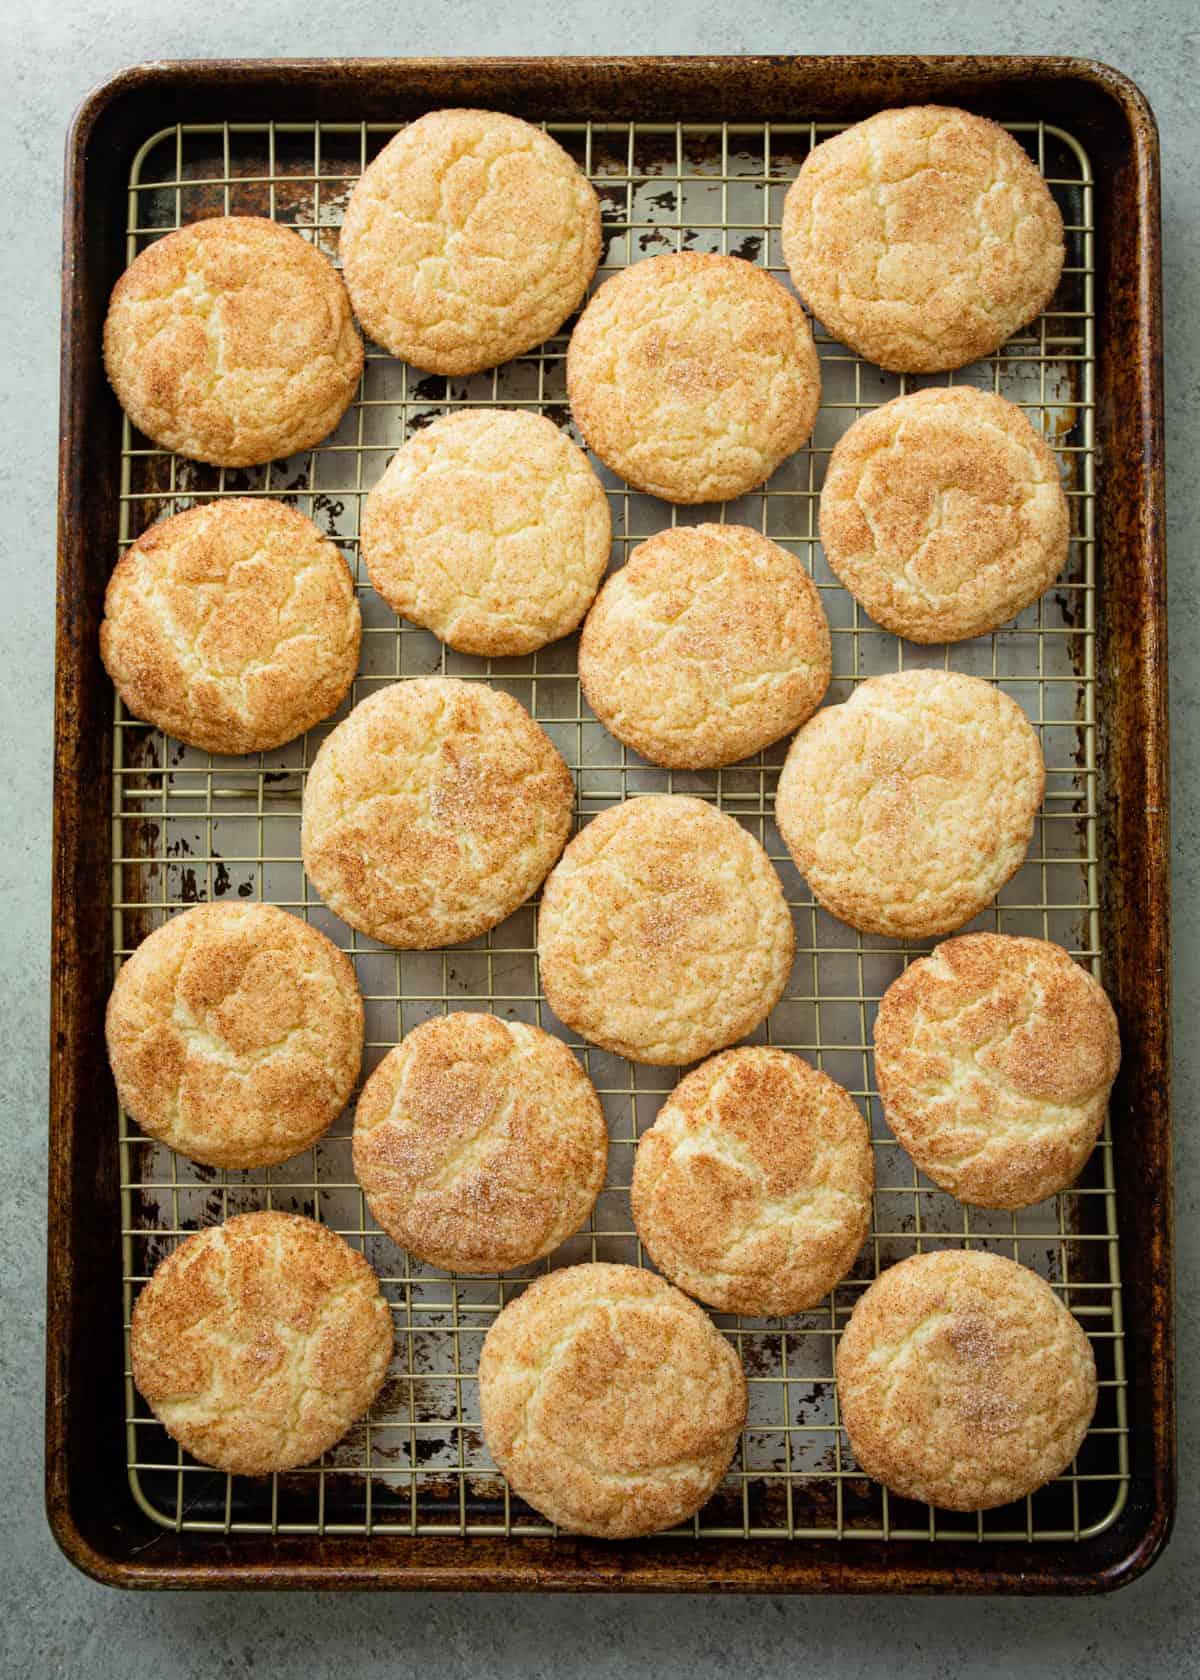 cookies on a sheet pan